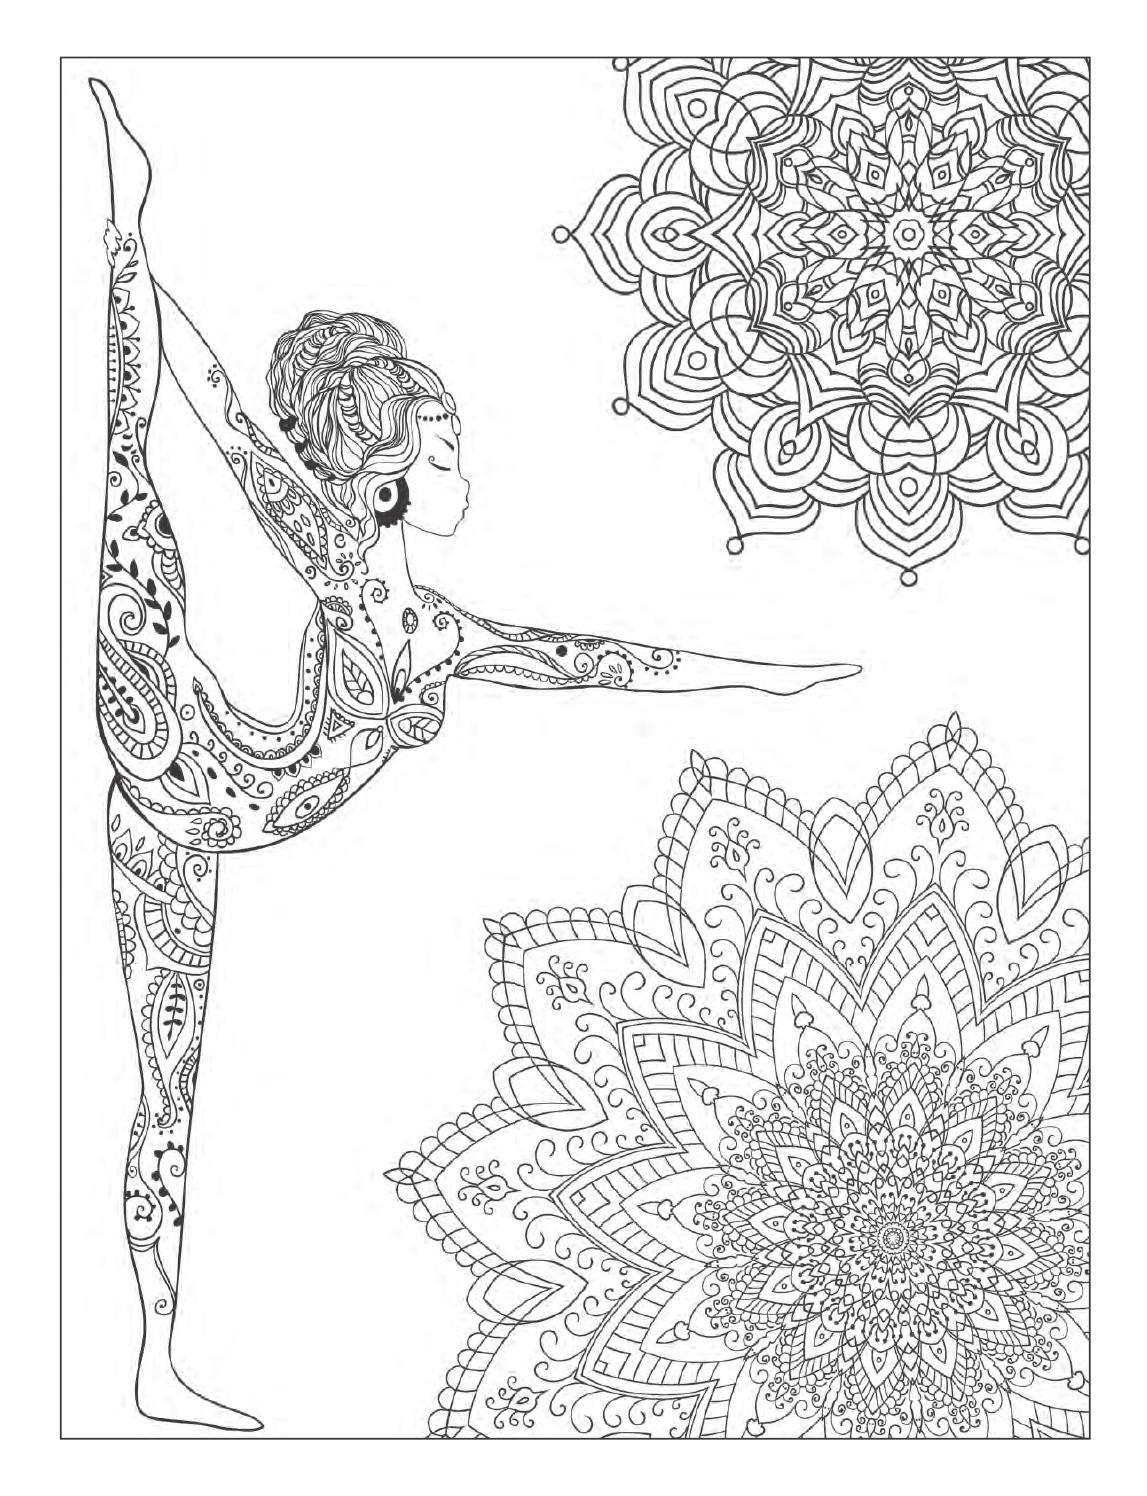 Yoga And Meditation Coloring Book For Adults With Yoga Poses And Mandalas Mandala Coloring Pages Mandala Coloring Designs Coloring Books